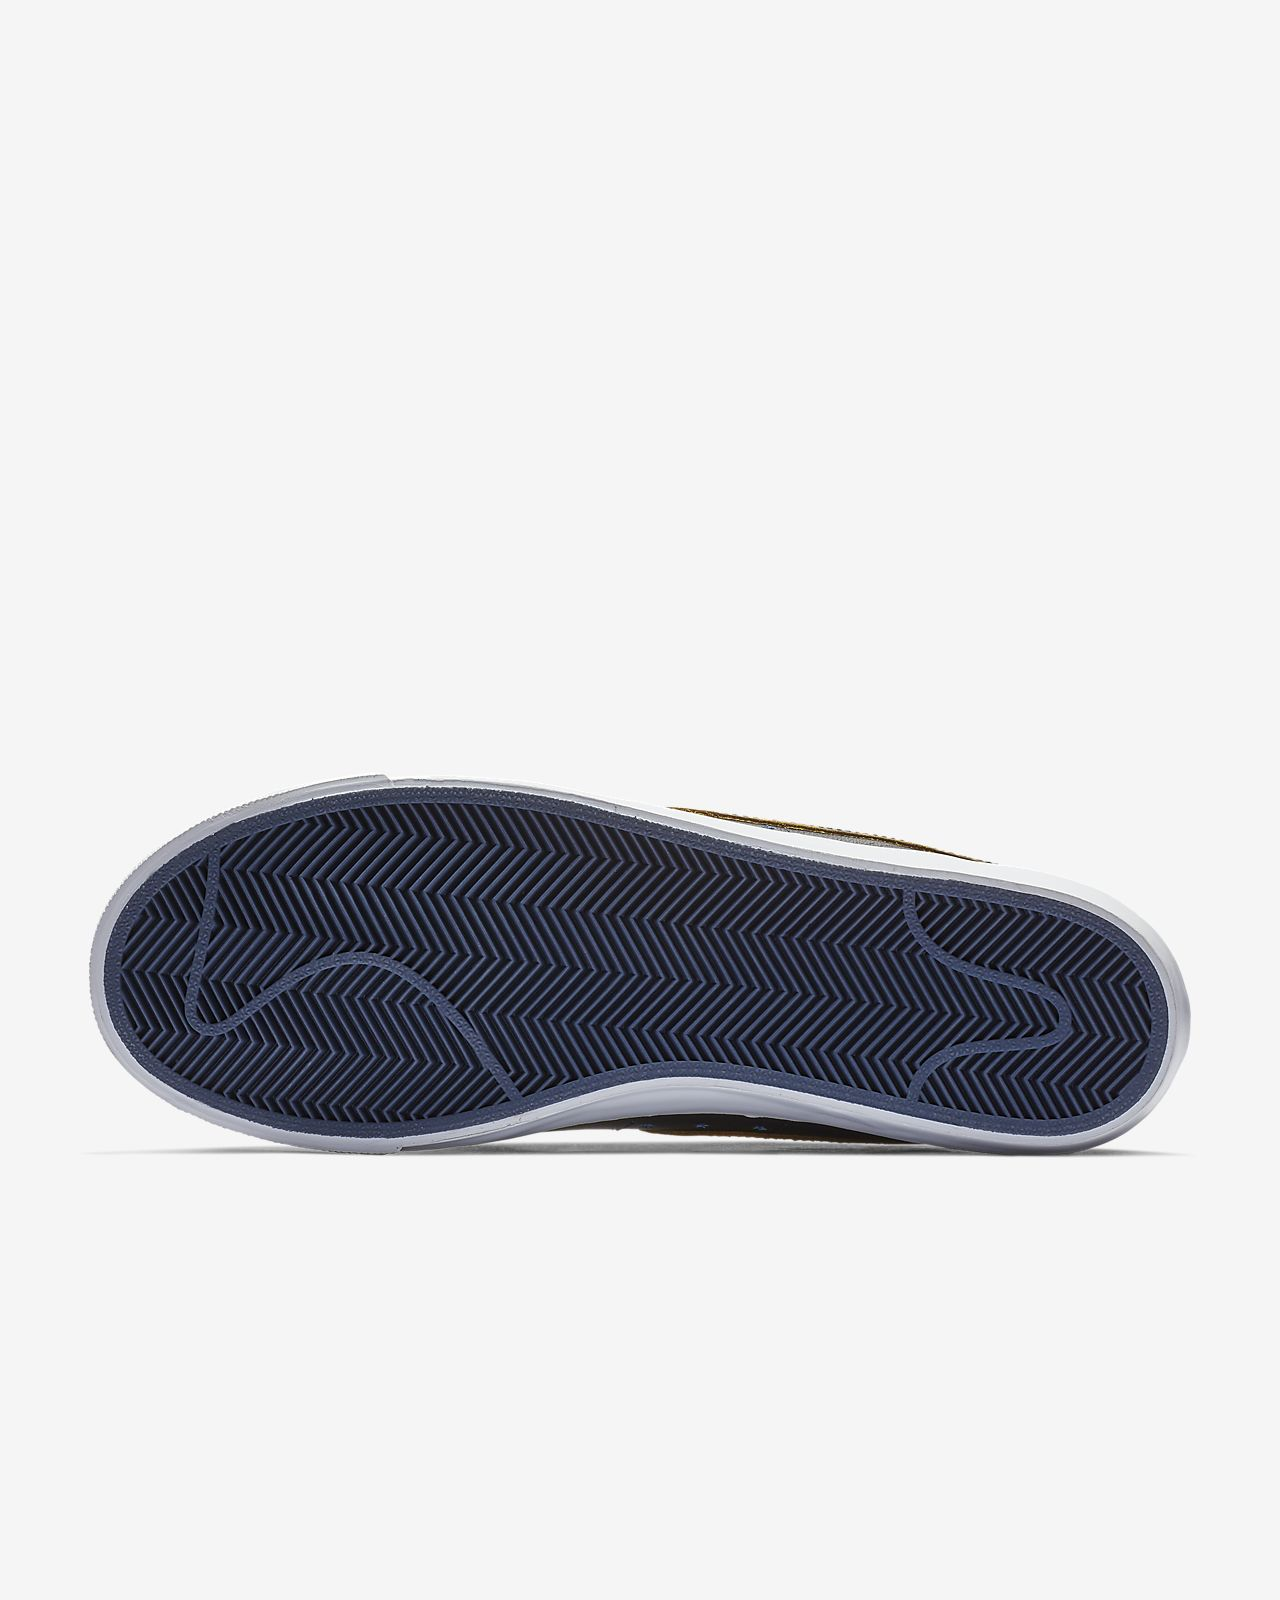 the latest 682a5 387c9 ... Chaussure de skateboard Nike SB Blazer Low GT NBA pour Homme